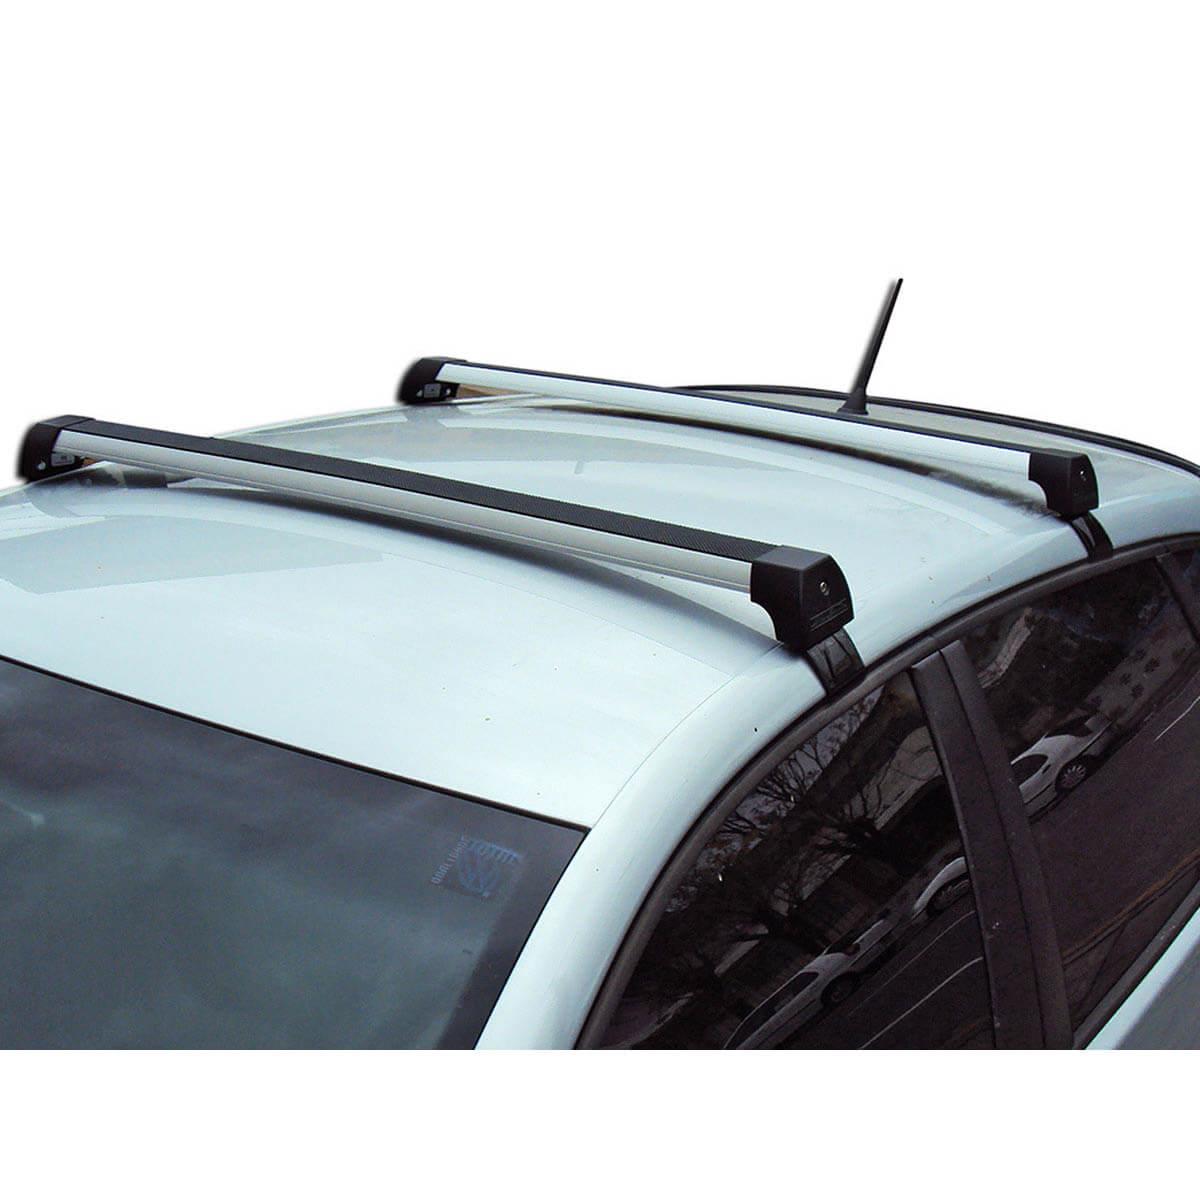 Rack de teto Long Life Sports Corsa hatch ou sedan 1994 a 2003 4 portas ou Classic 2005 a 2015